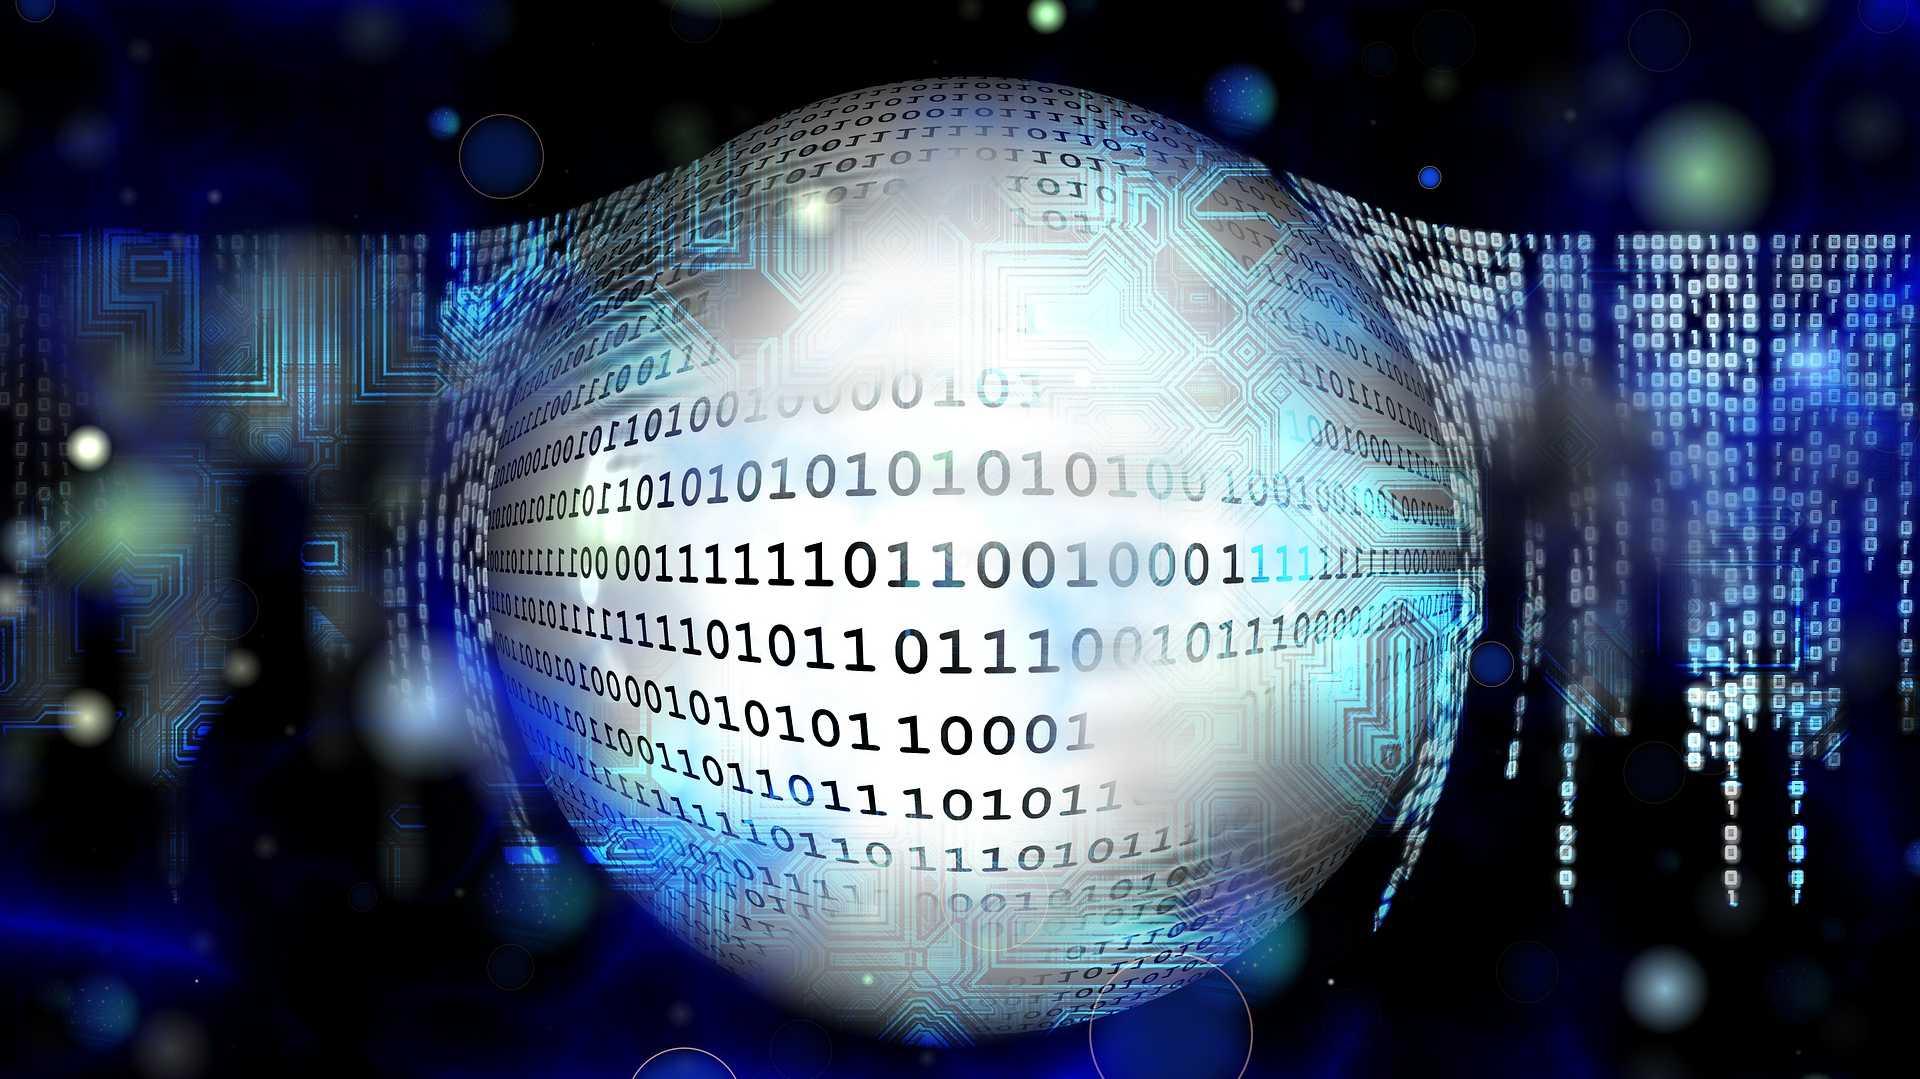 Verschlüsselung, Binär, Daten, Kryptographie